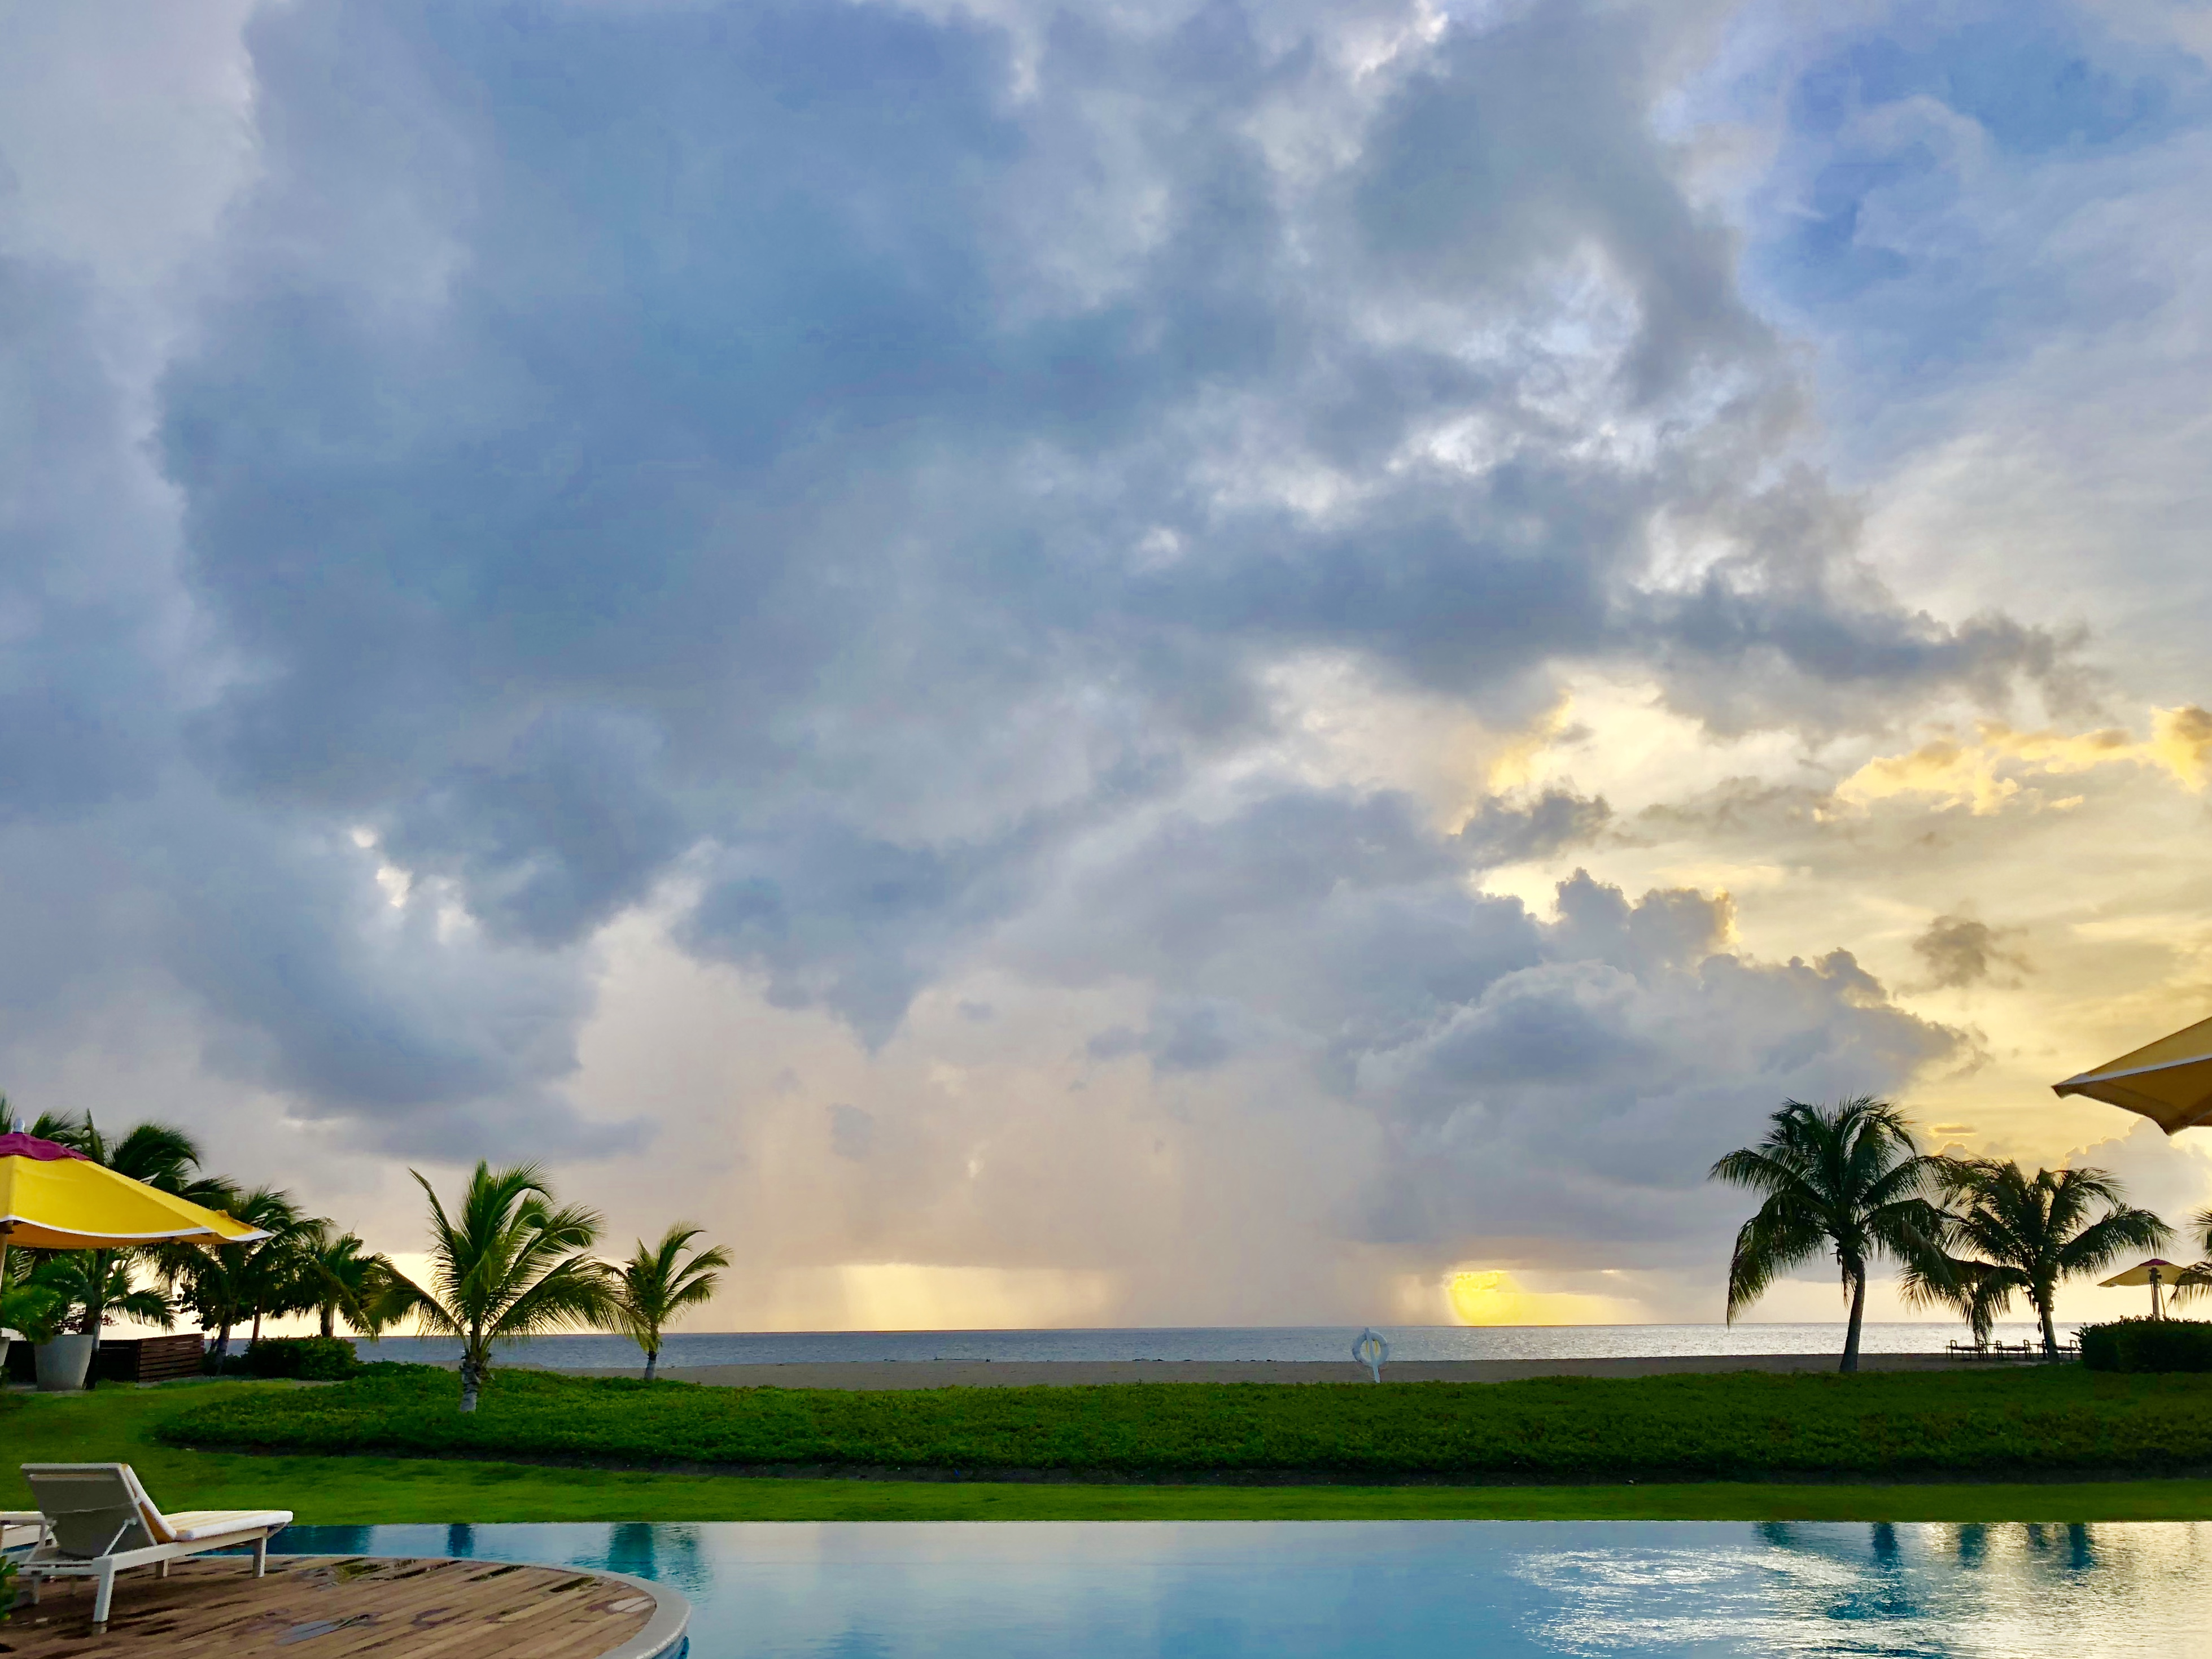 four seasons, four seasons nevis, st. kitts, nevis, caribbean, resort, hotel, ocean, pool, spa, massage, sunset, sky, blue sky